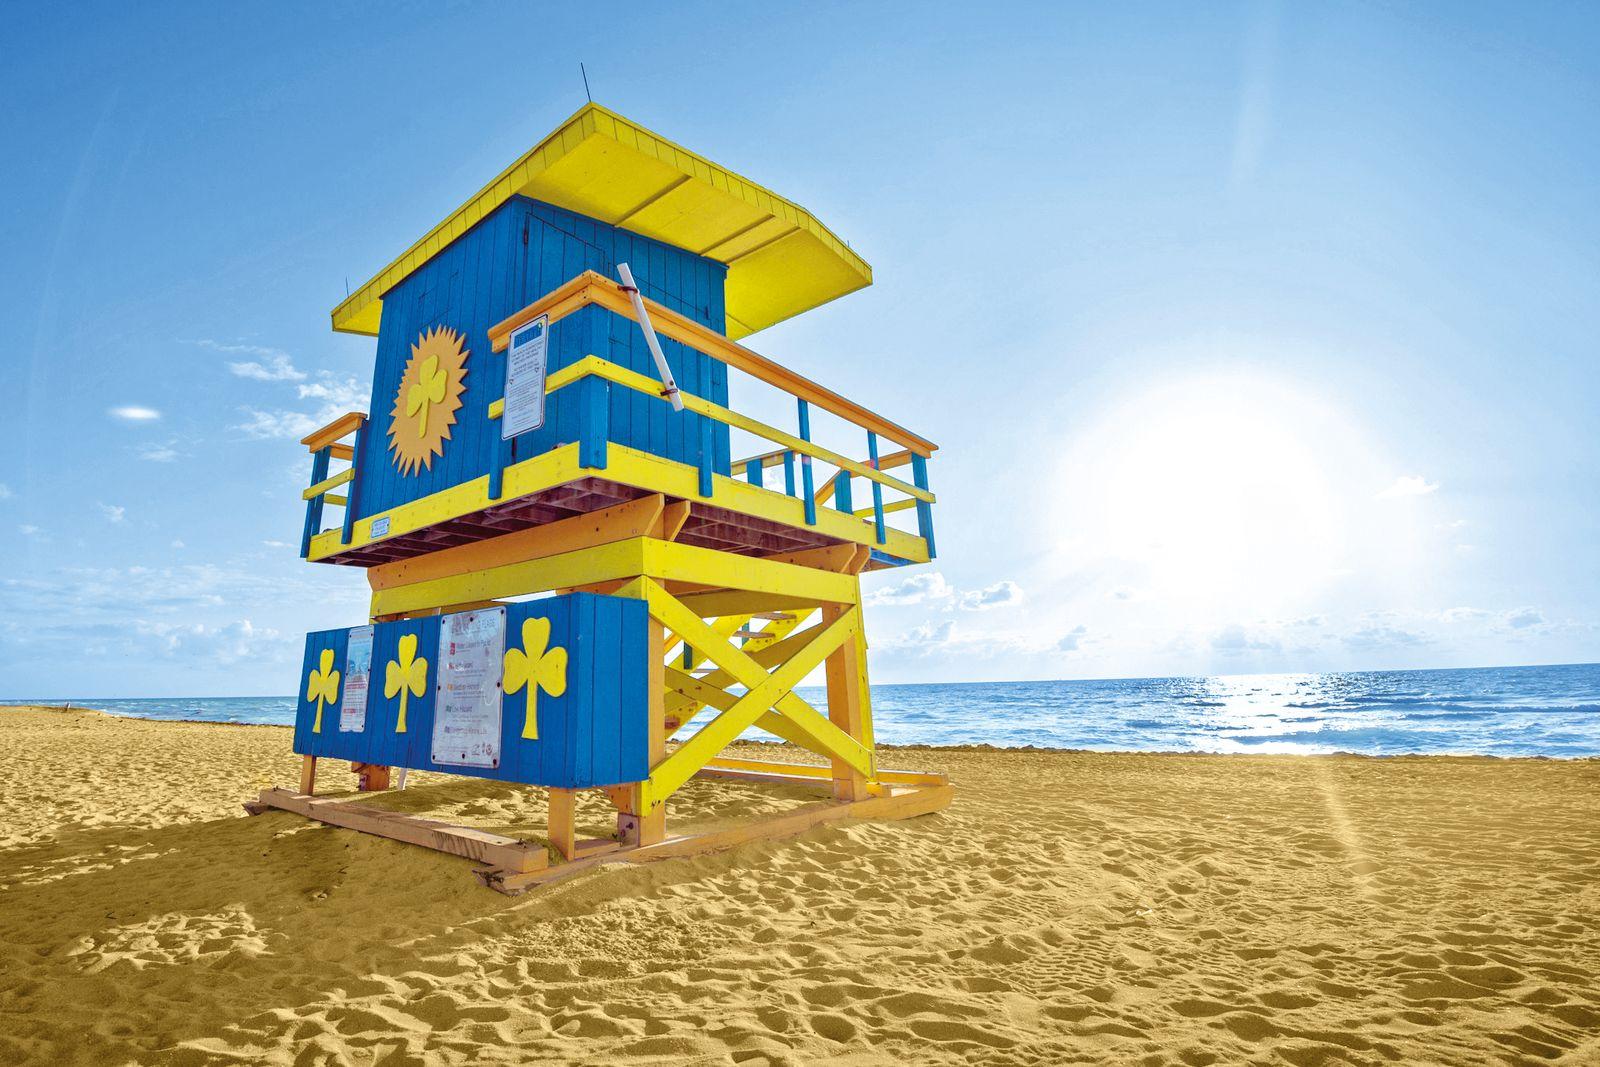 Lifeguard-Turm auf dem North Miami Beach